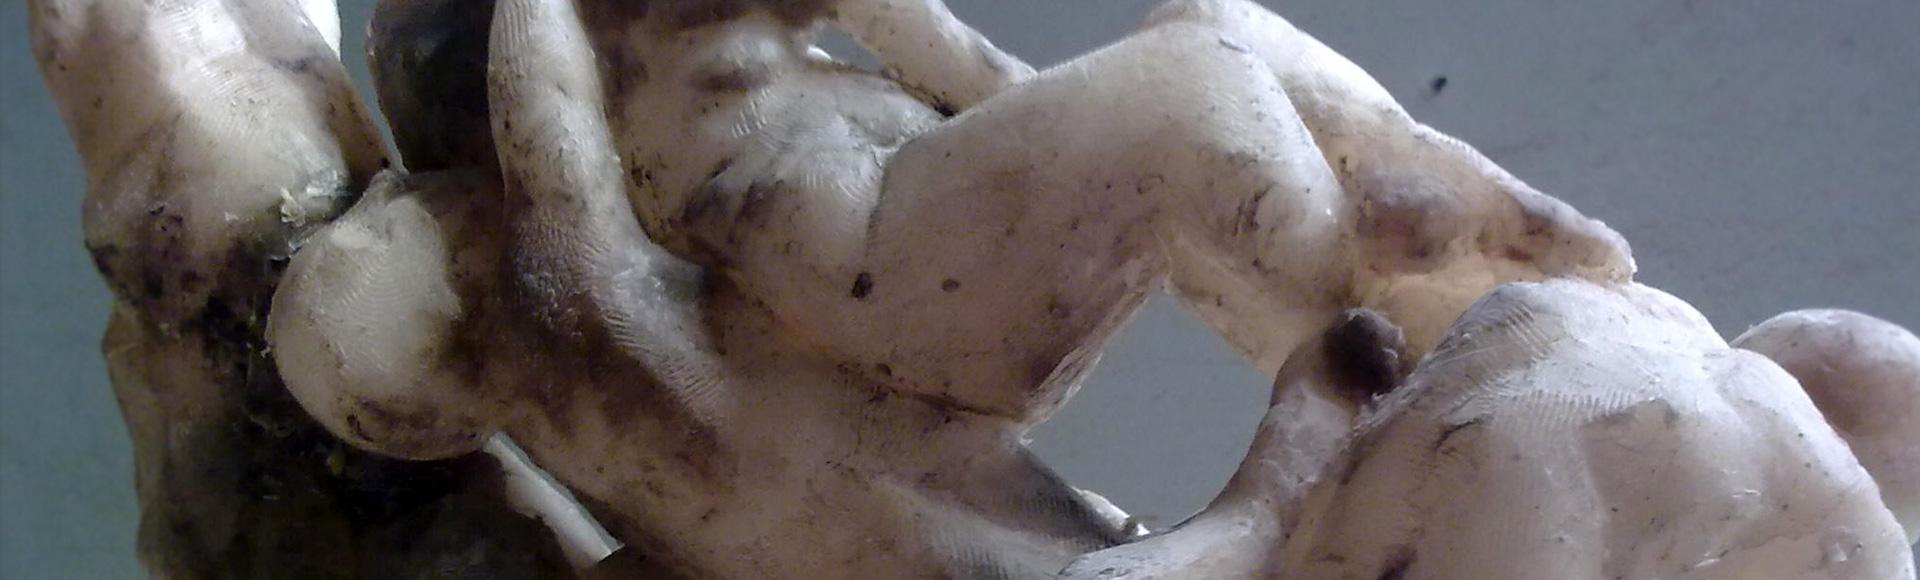 Willkommen in der Skulpturenwerkstatt Harms